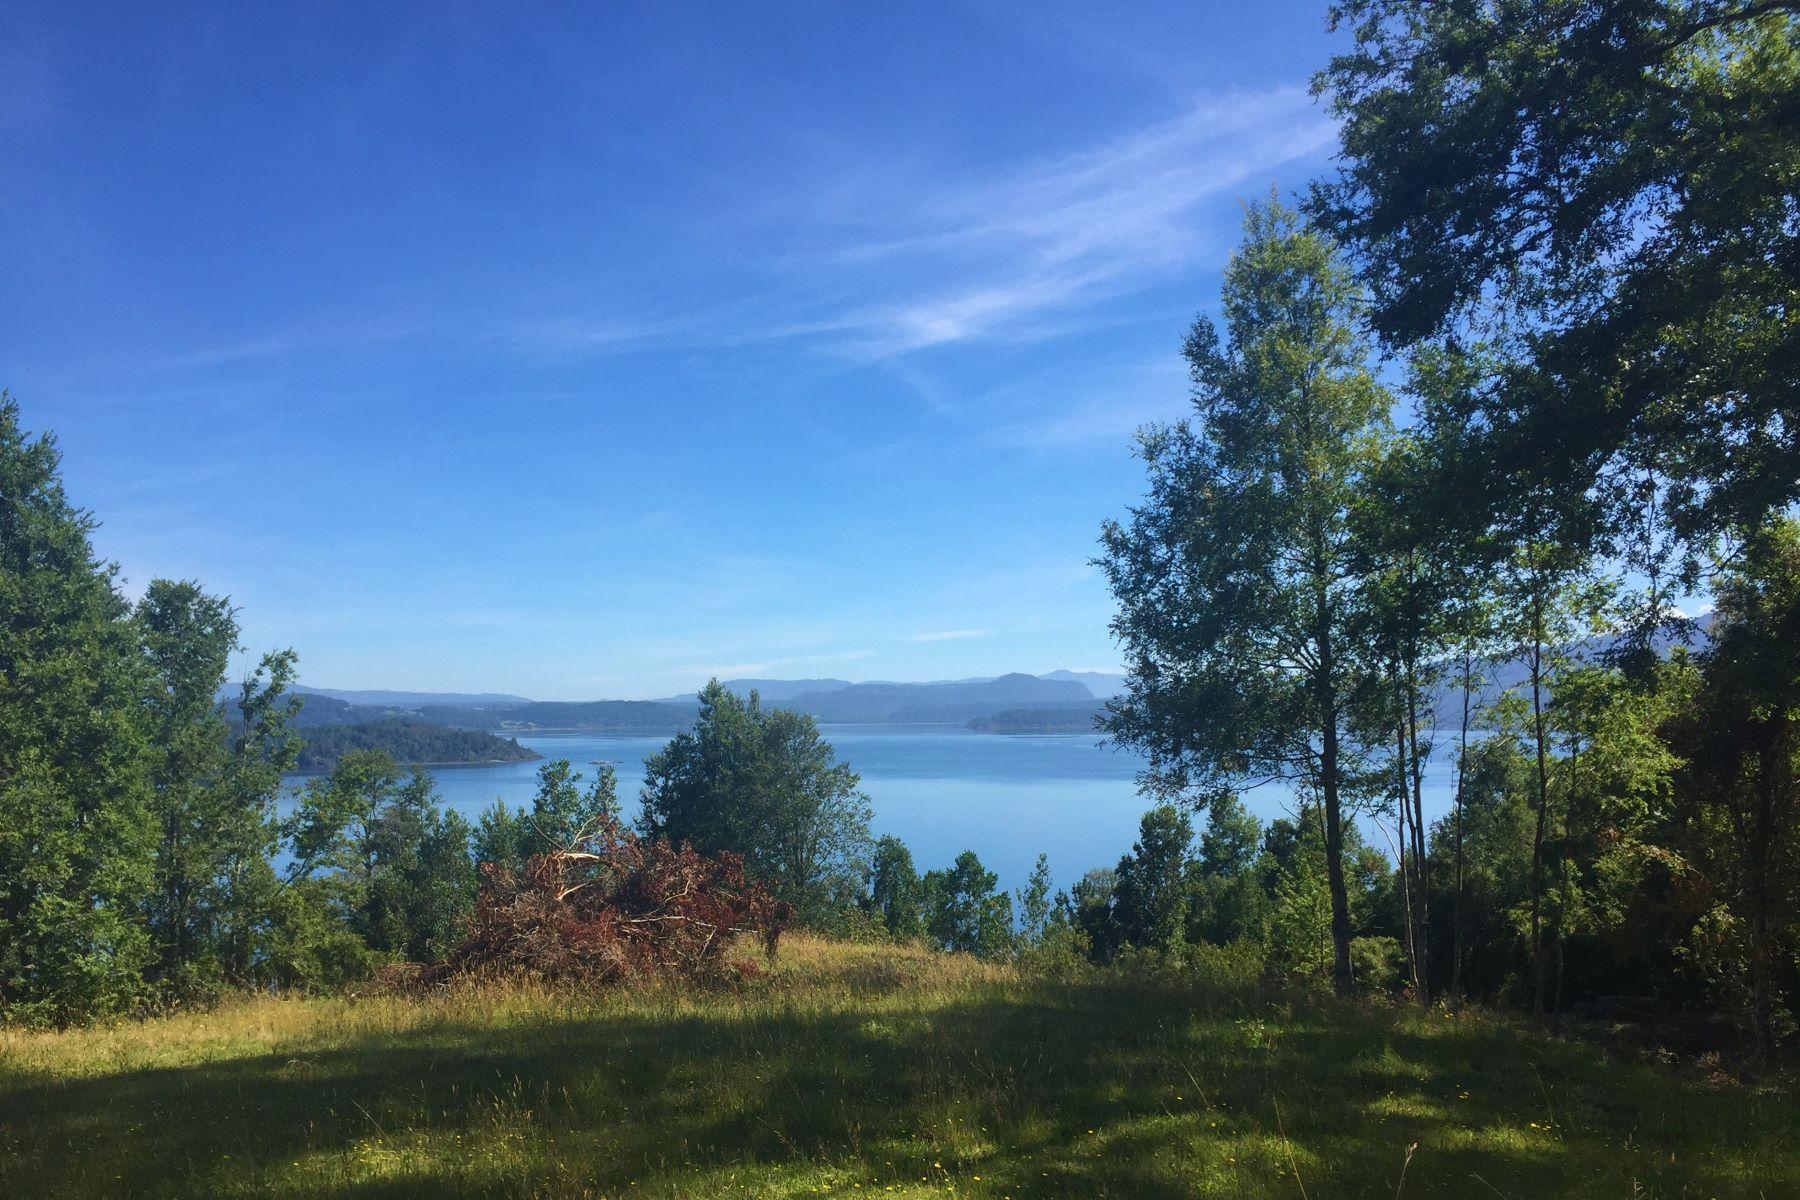 农场 / 牧场 / 种植园 为 销售 在 Chilean Landscape Beauty Lago Panguipulli Valdivia, Valdivia 智利